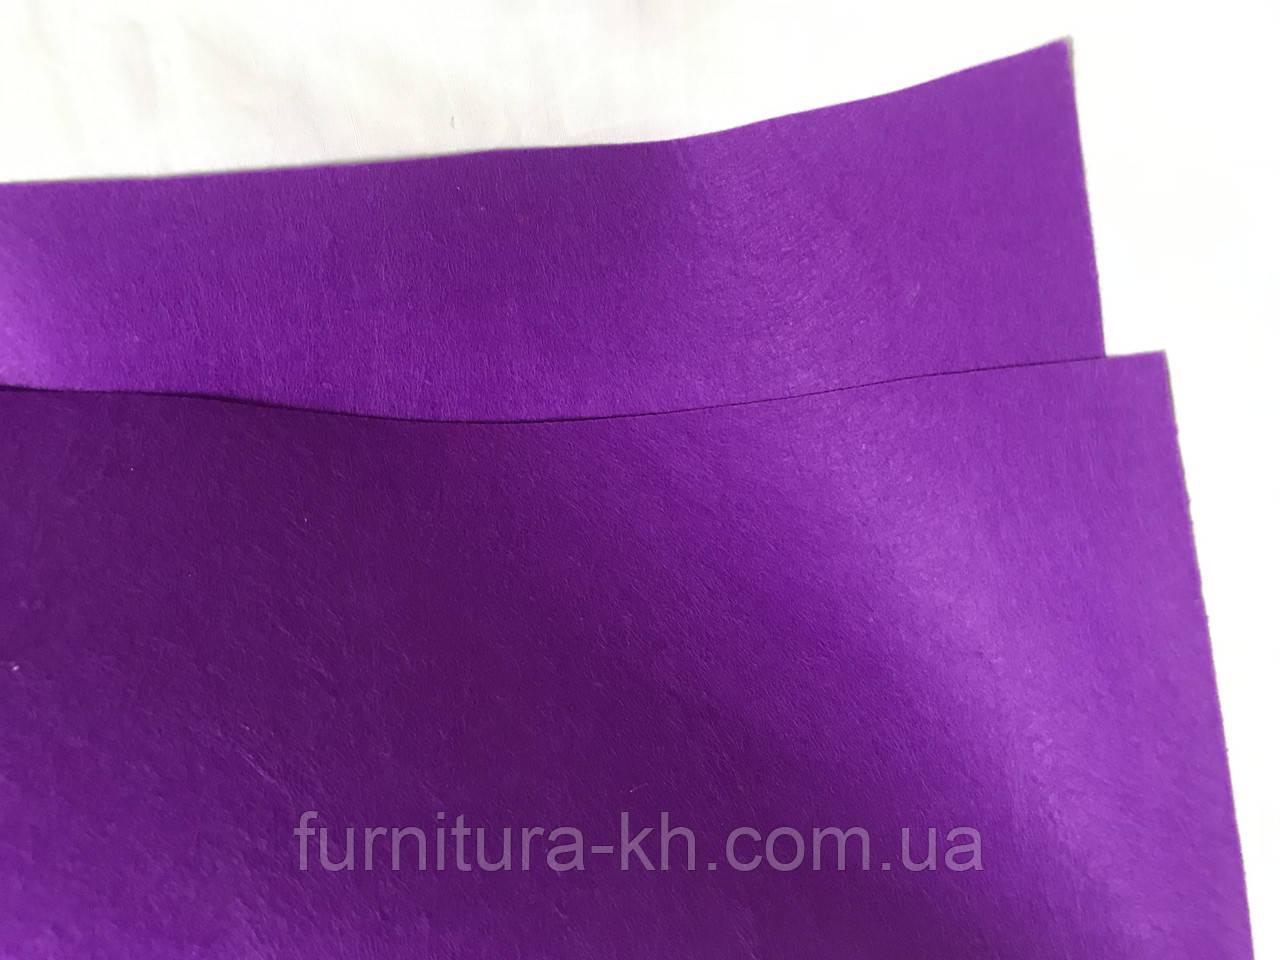 Фетр  фиолетовый, размер 50 Х 40 см, толщина 2 мм